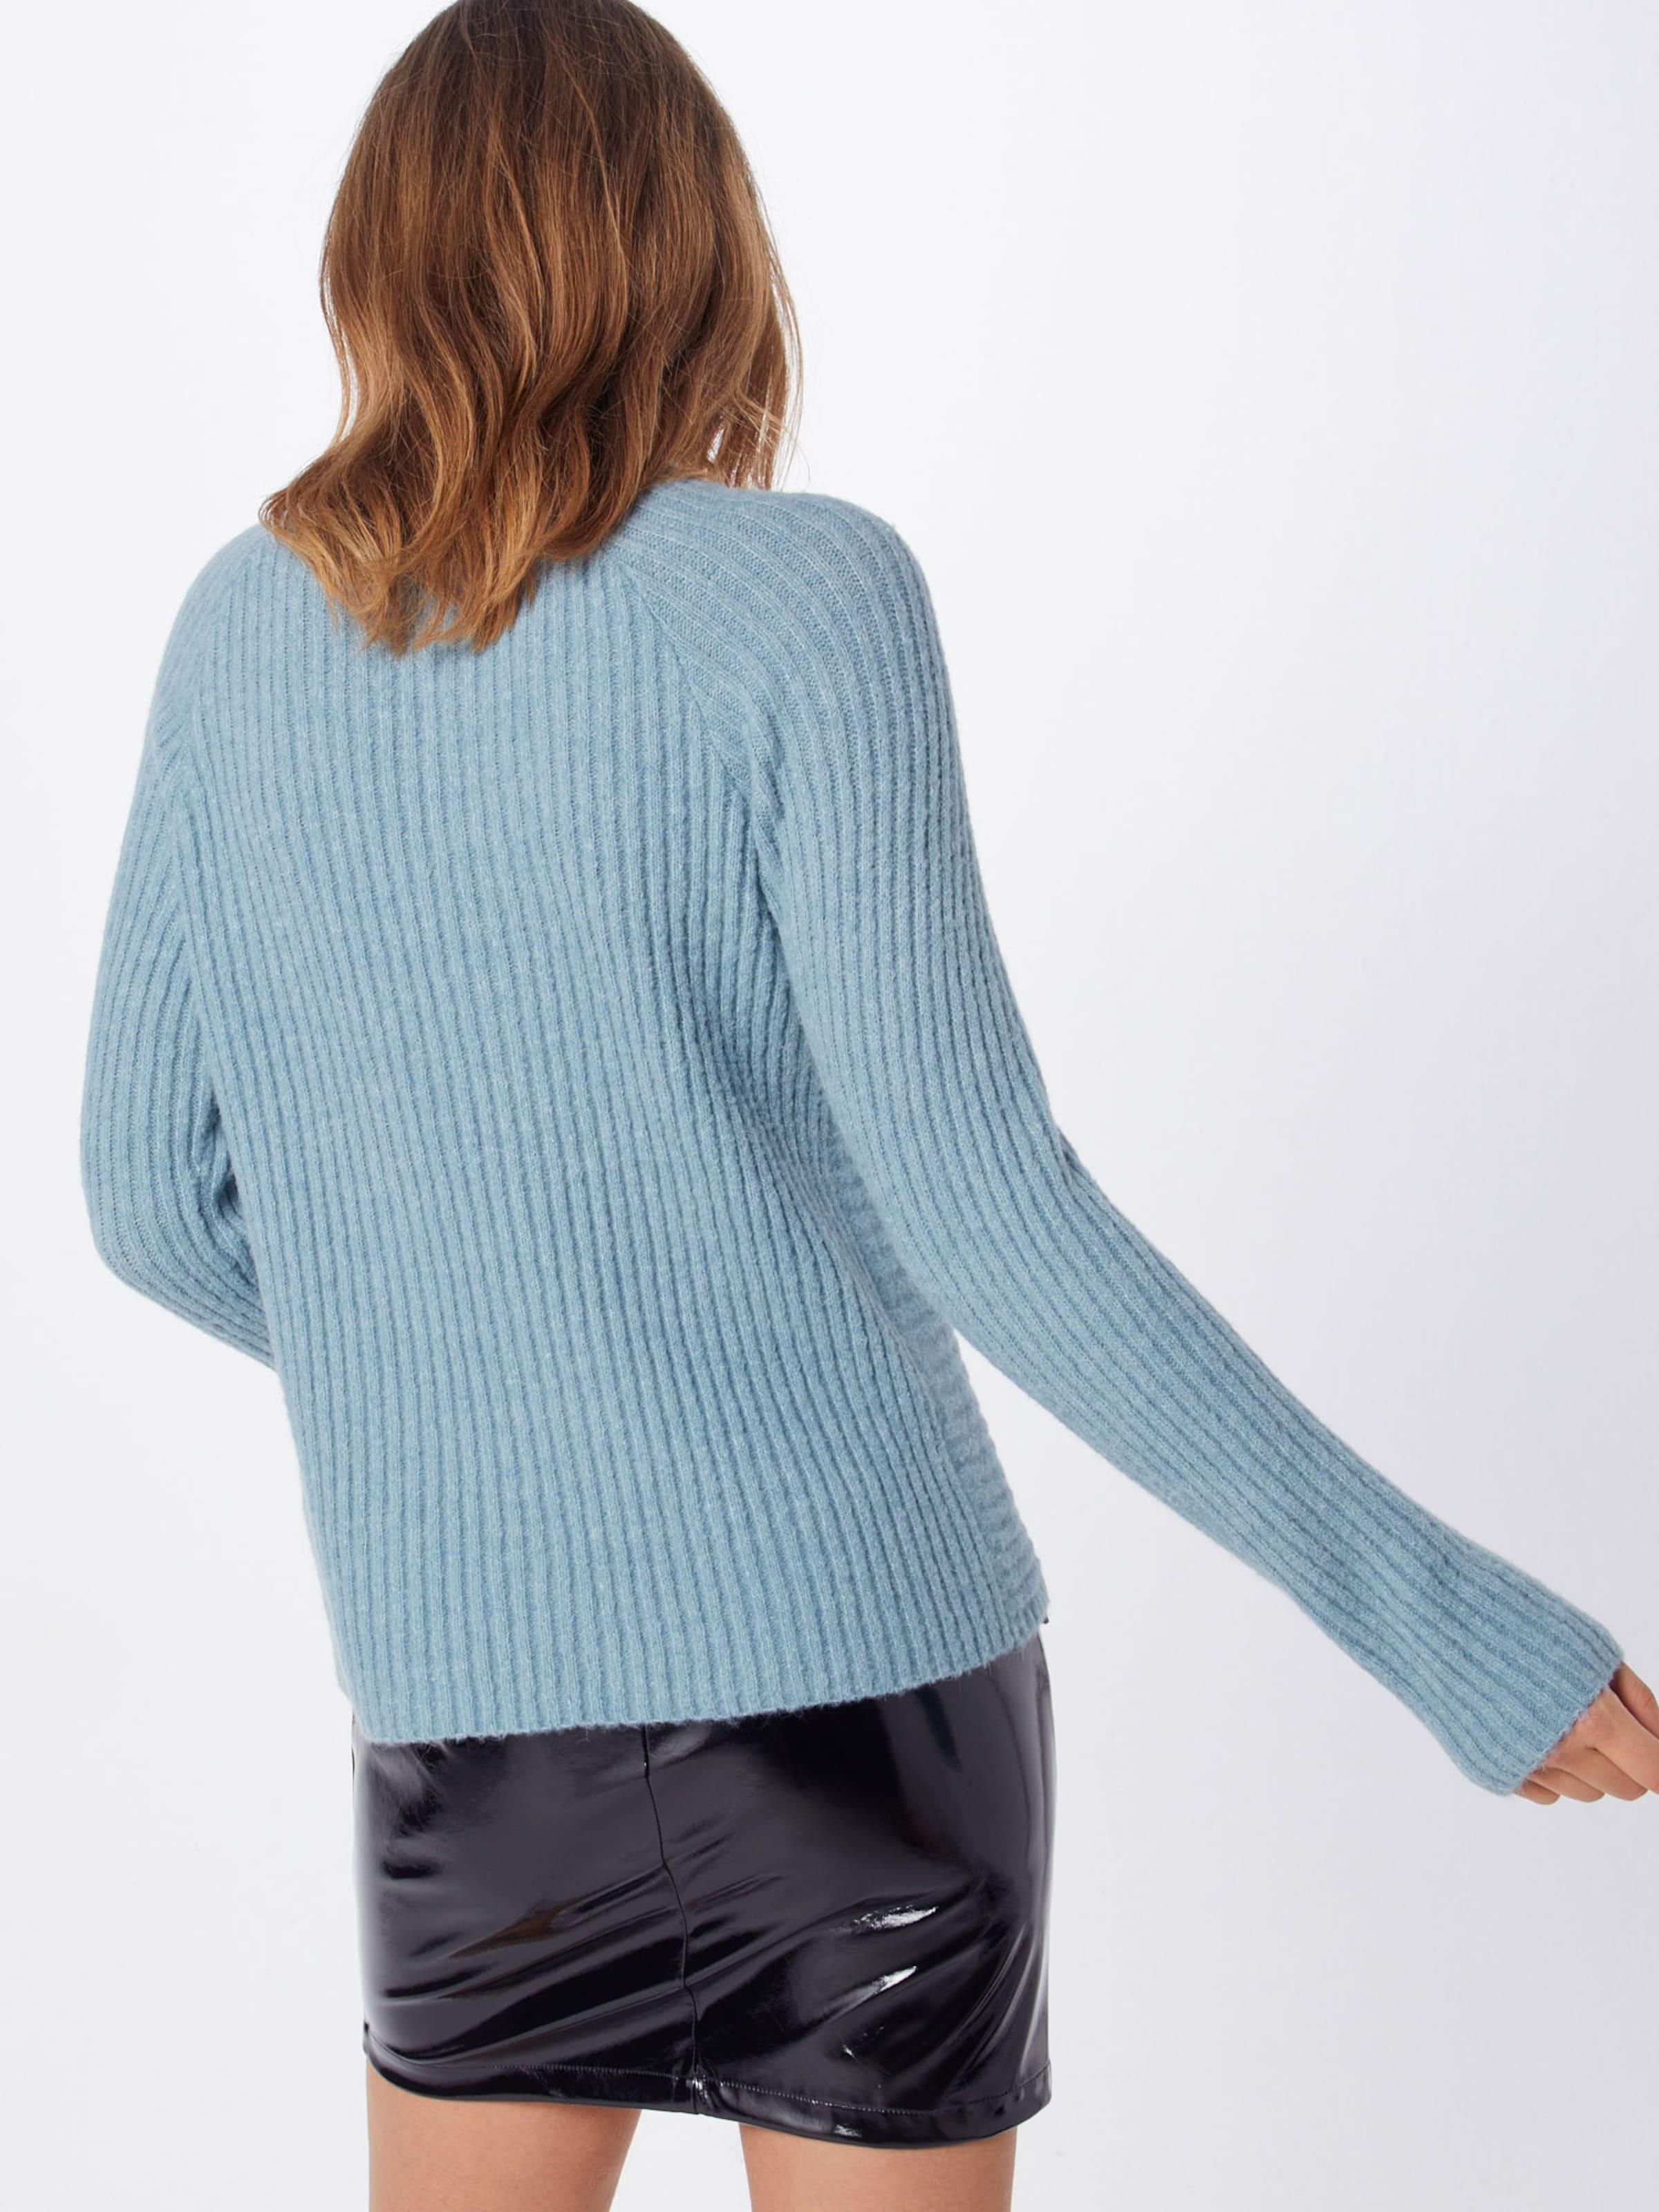 Pullover Pullover In 'objnonsia' Object Object Hellblau 'objnonsia' 7yfgY6b